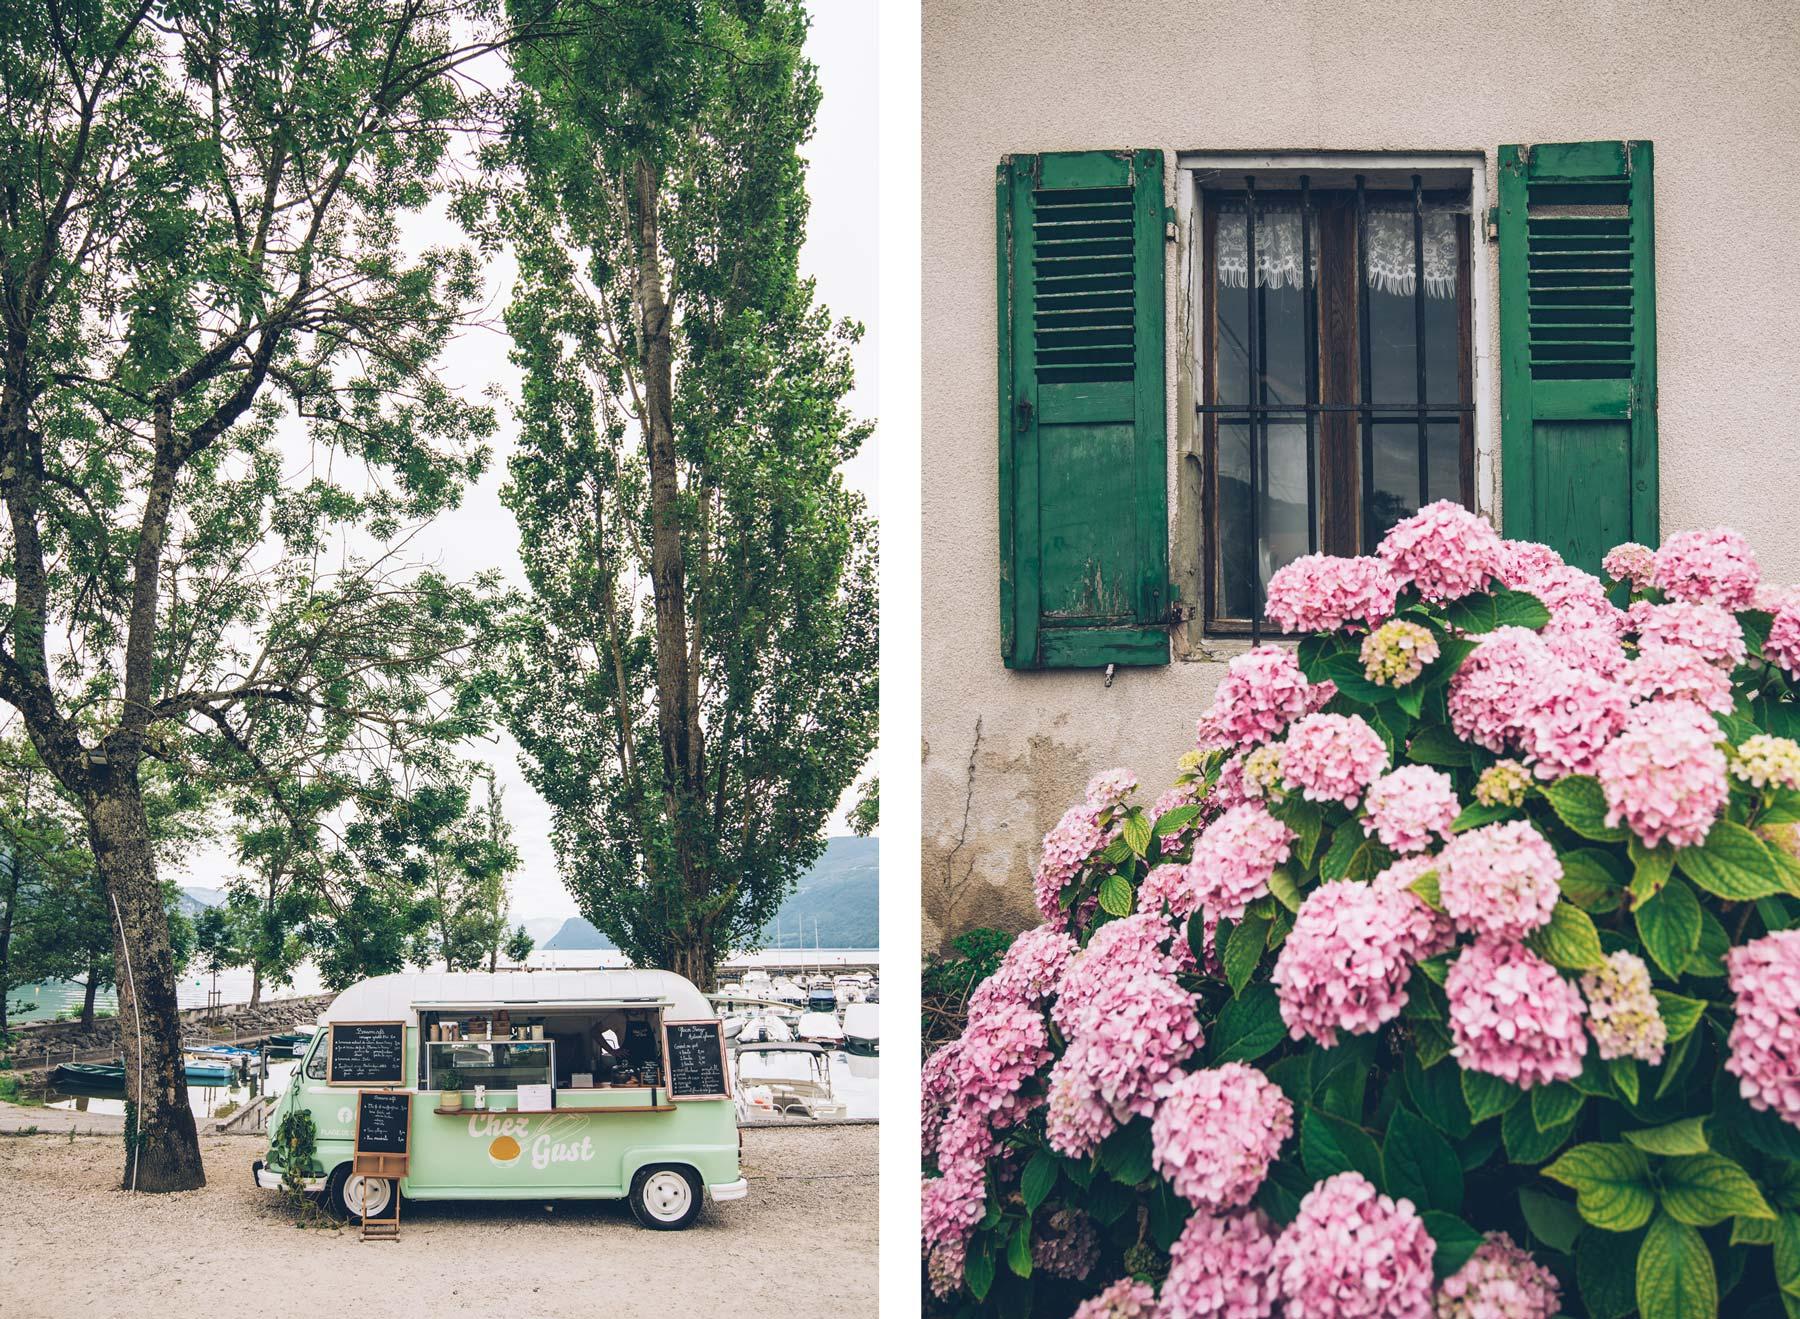 Chindrieux, Aix les Bains Riviera